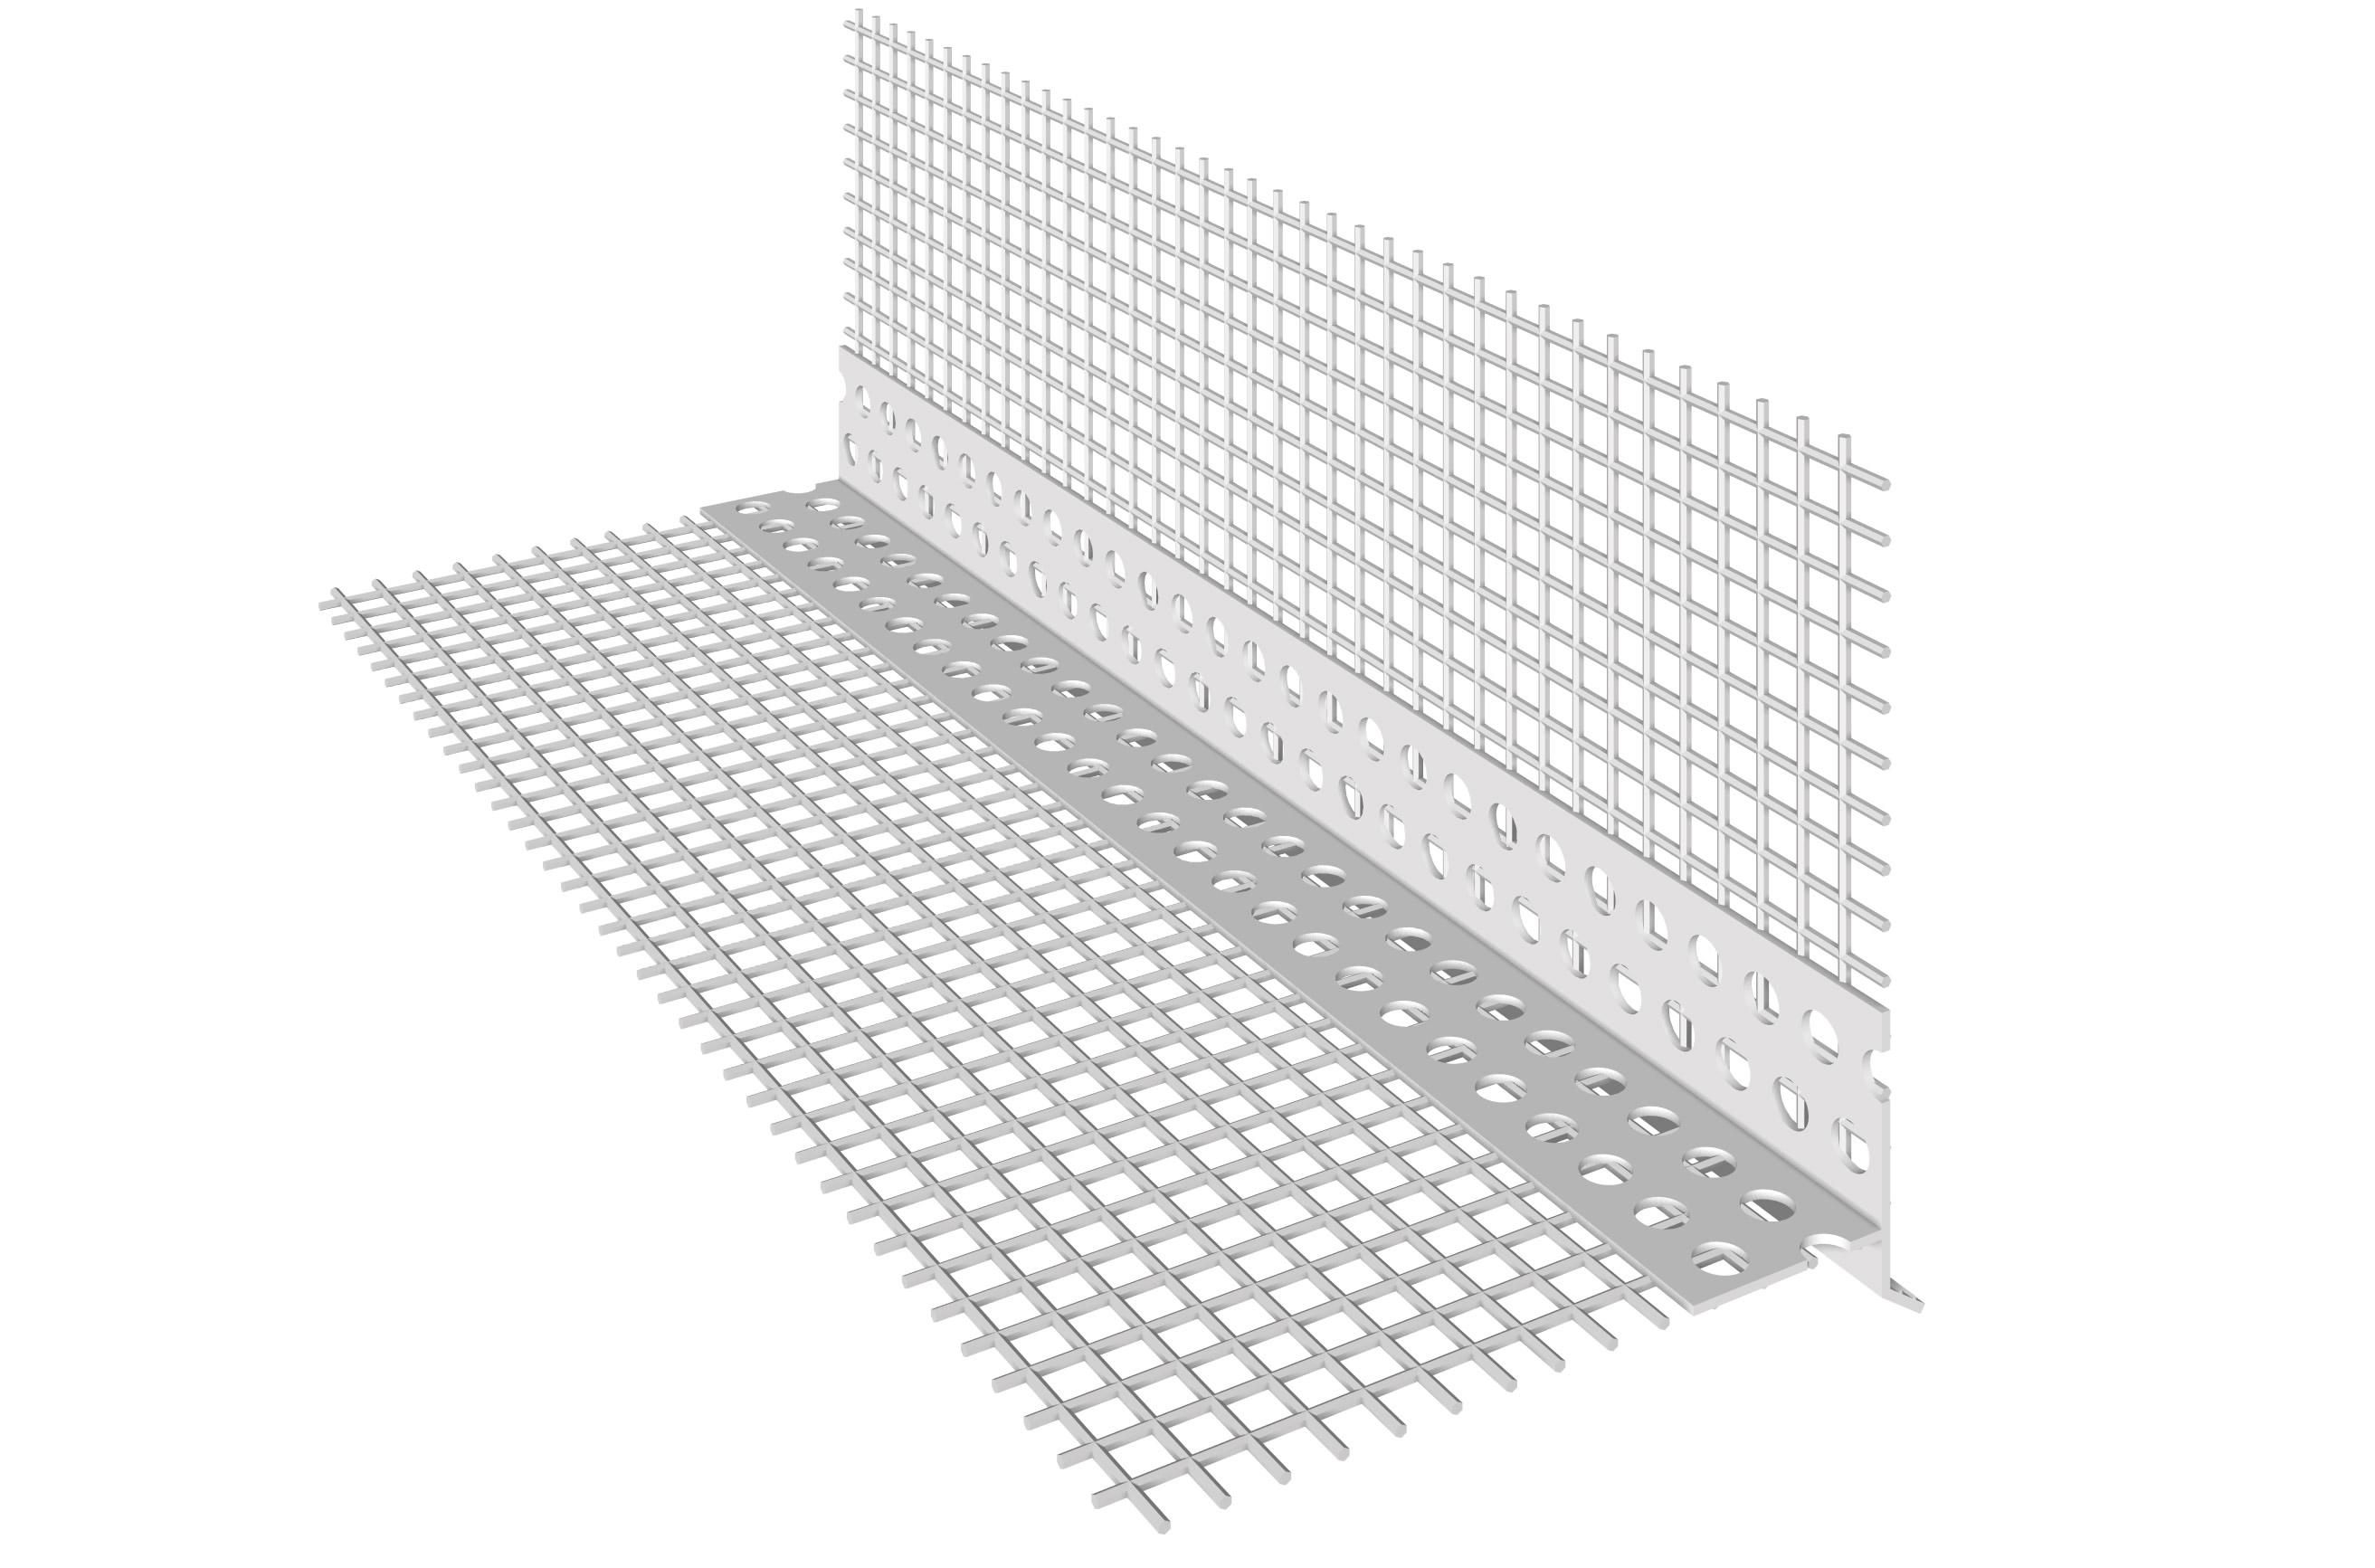 PARASPIGOLO IN PVC CON GOCCIOLATOIO DIAGONALE: Paraspigolo in PVC con rete in fibra di vetro preincollata e gocciolatoio diagonale